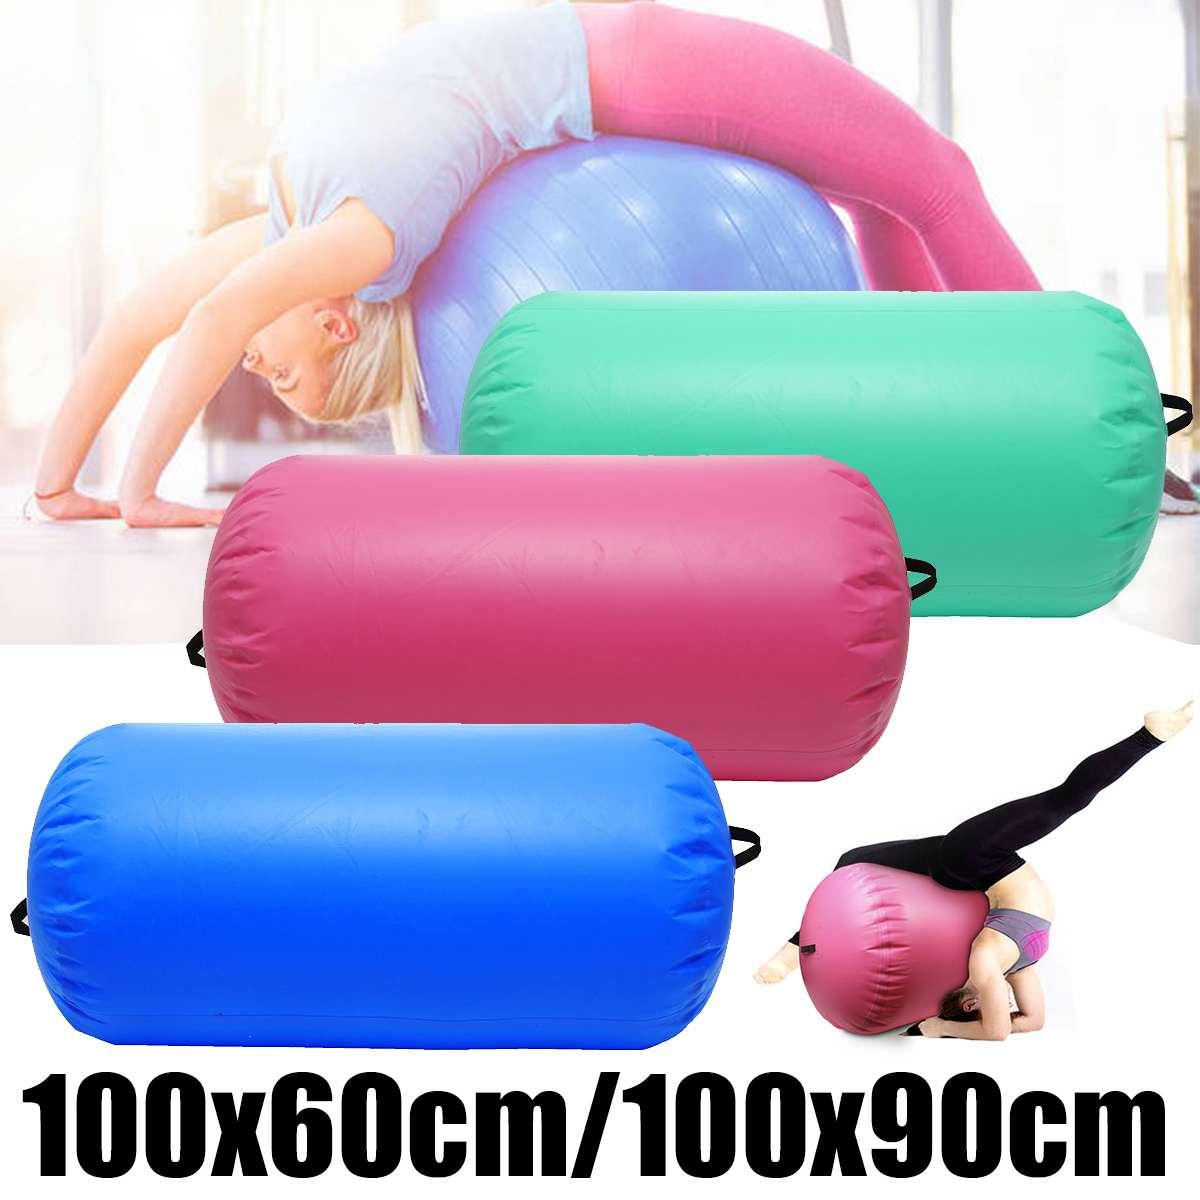 Inflatable PVC Gymnastics Air Barrel Roller Tumbling Mat Fitness Yoga Workout